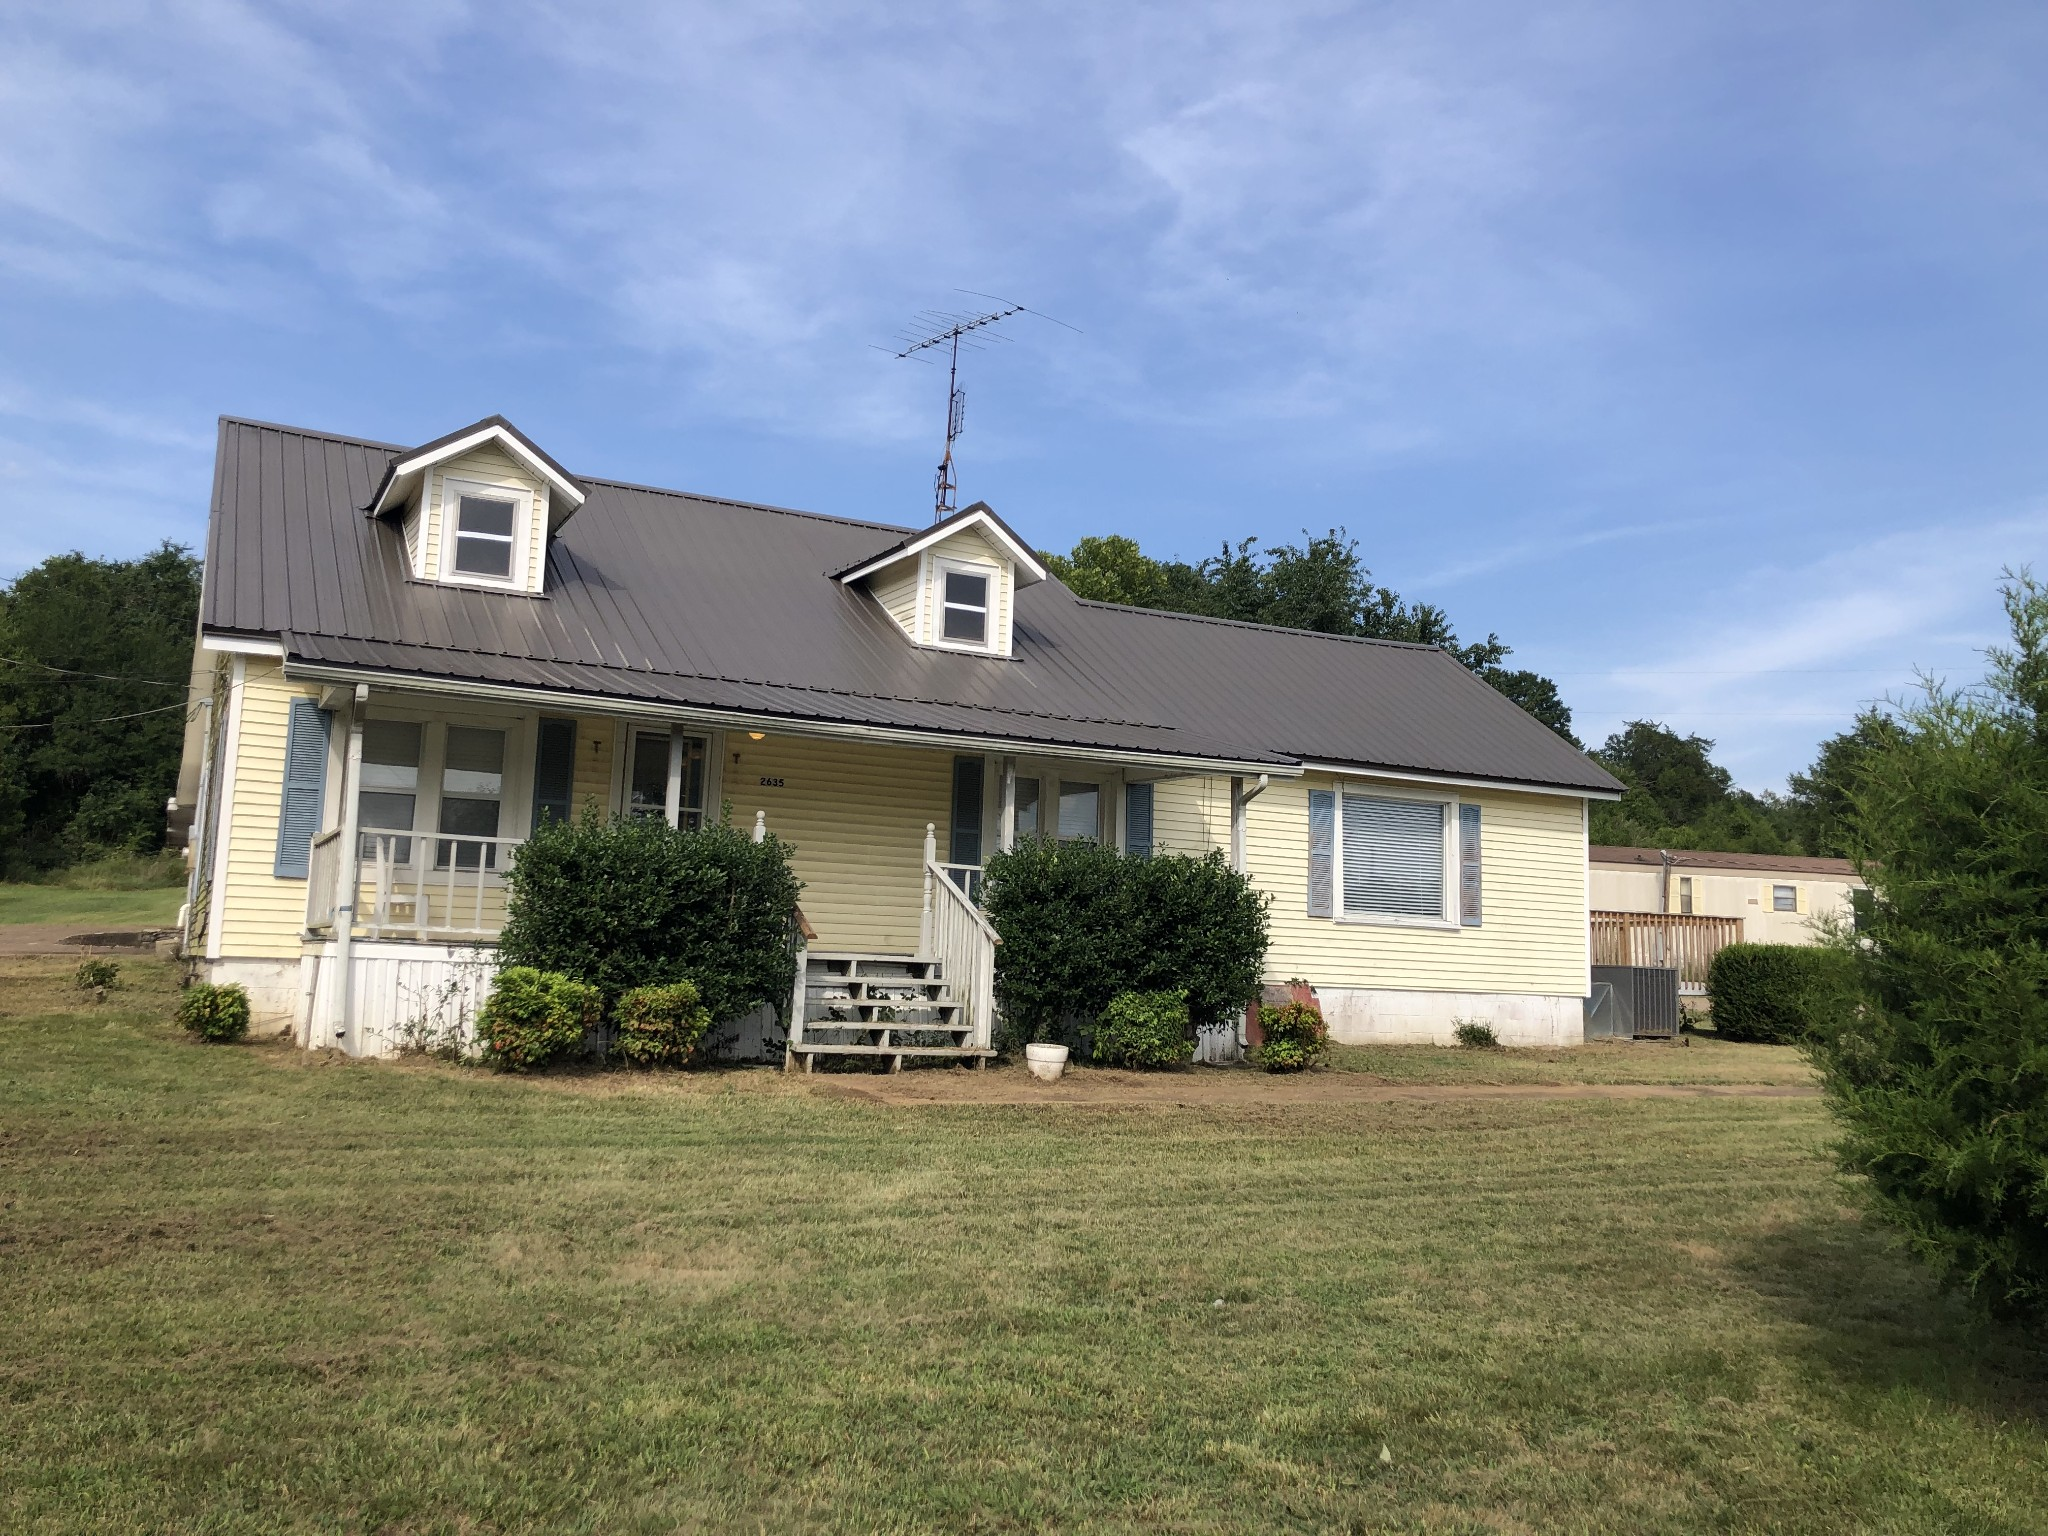 2635 Elkton Pike, S, Pulaski, TN 38478 - Pulaski, TN real estate listing